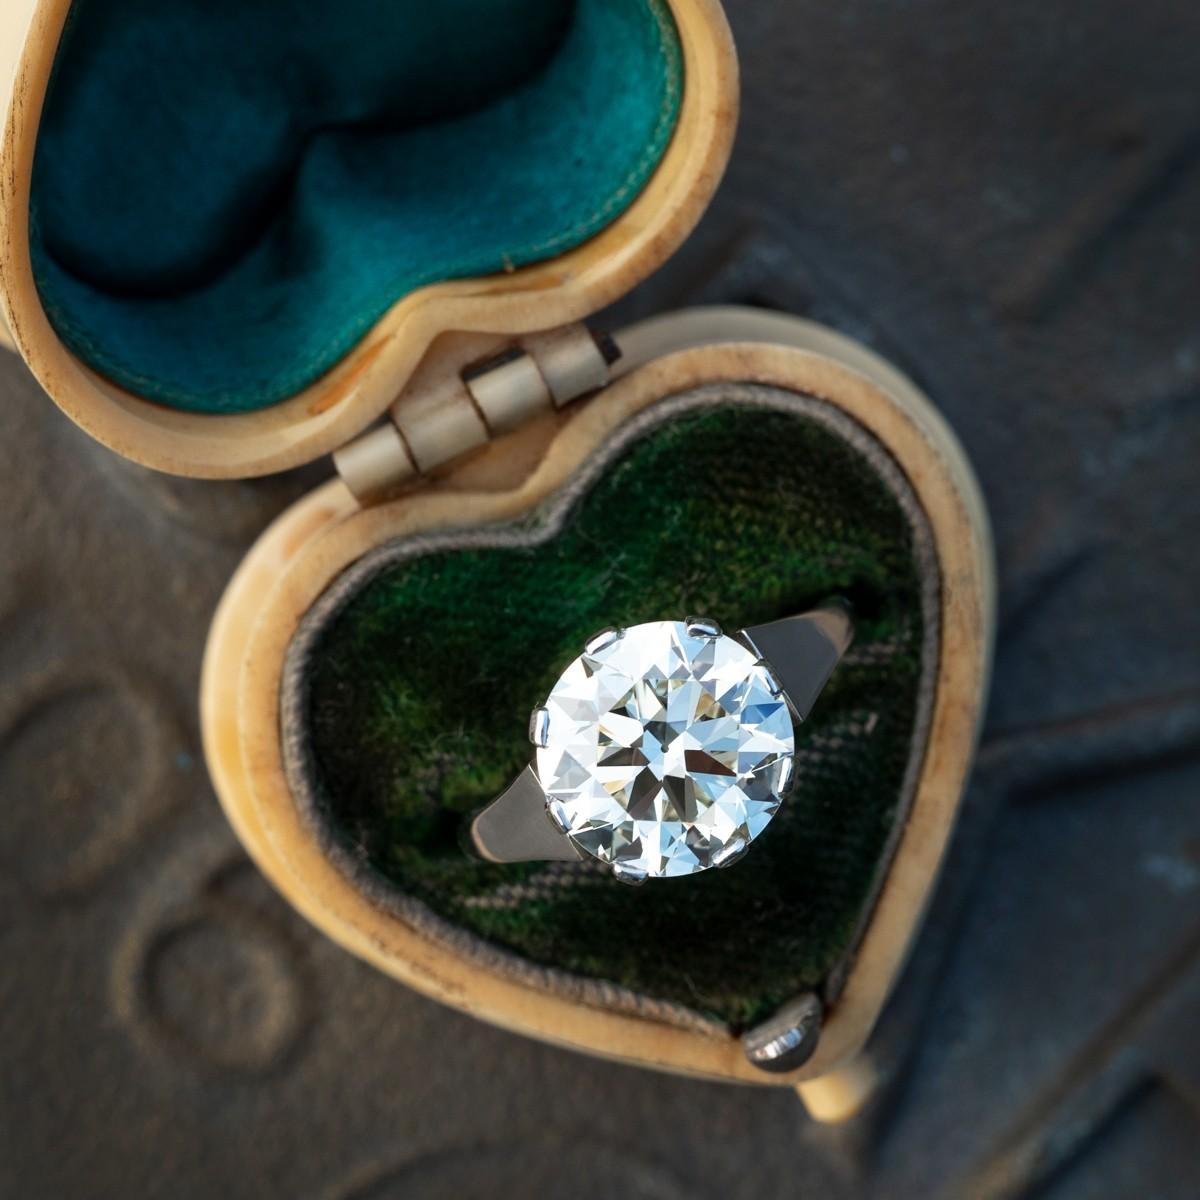 3 Carat Transitional Cut Diamond Solitaire Ring Platinum 1940's